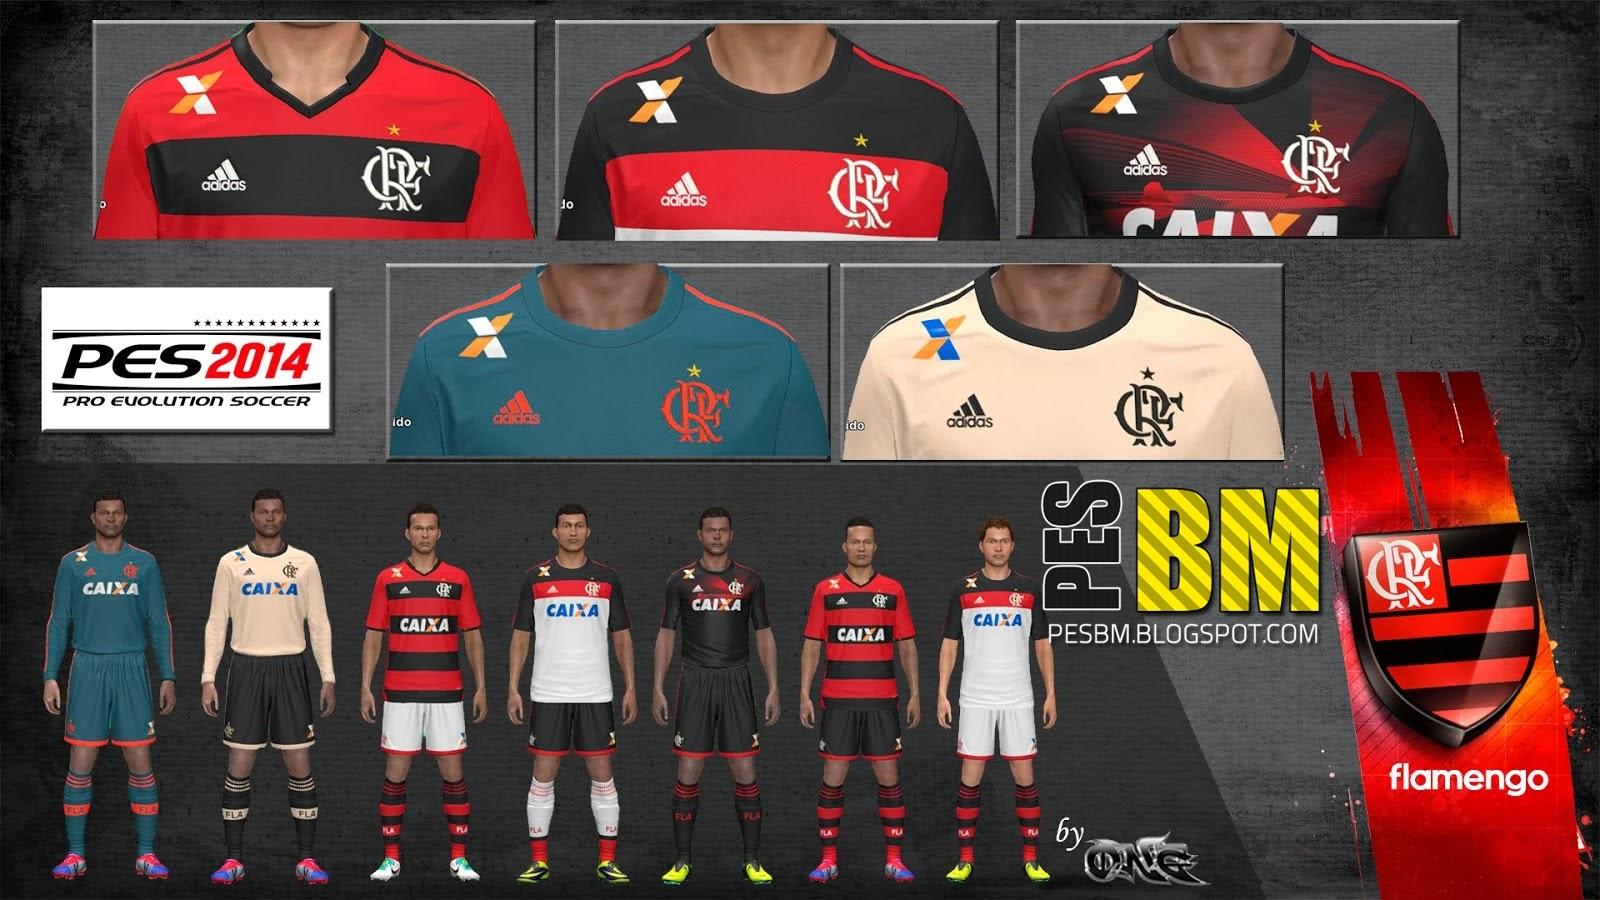 Uniforme do Flamengo Pes 2014 Pes 2014 Kit Flamengo 13-14